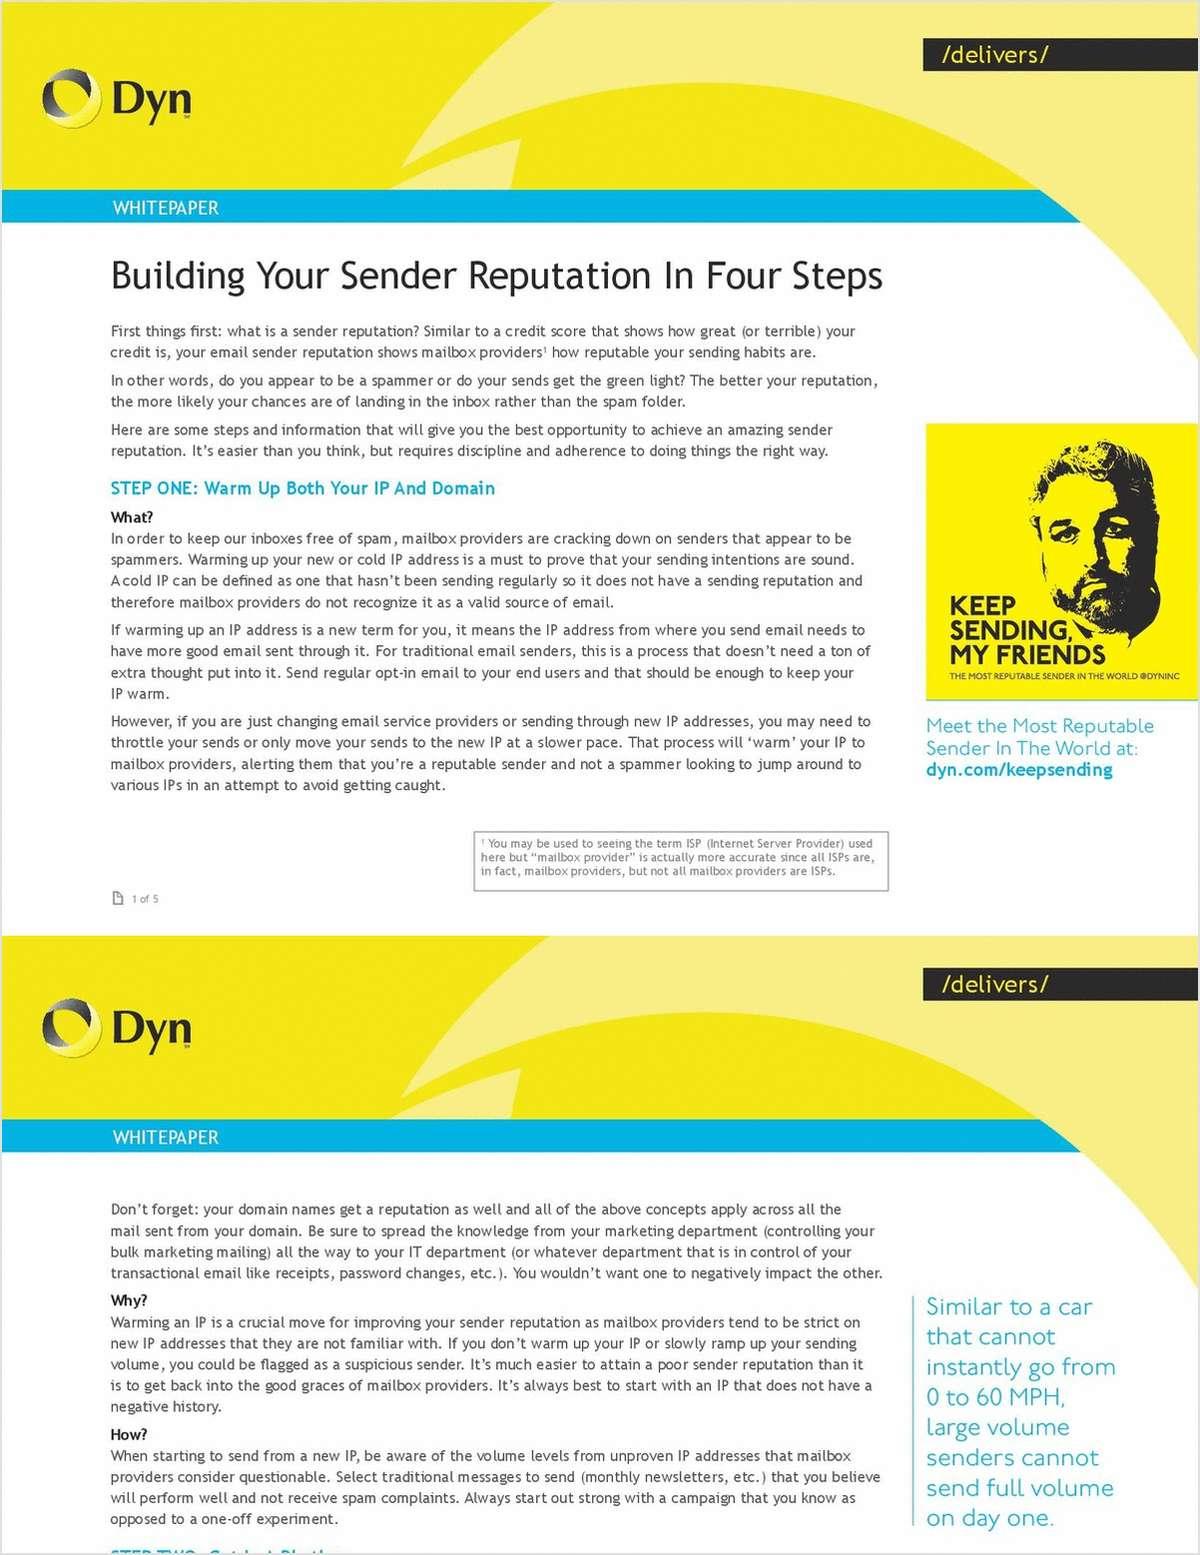 Building Your Sender Reputation in 4 Steps